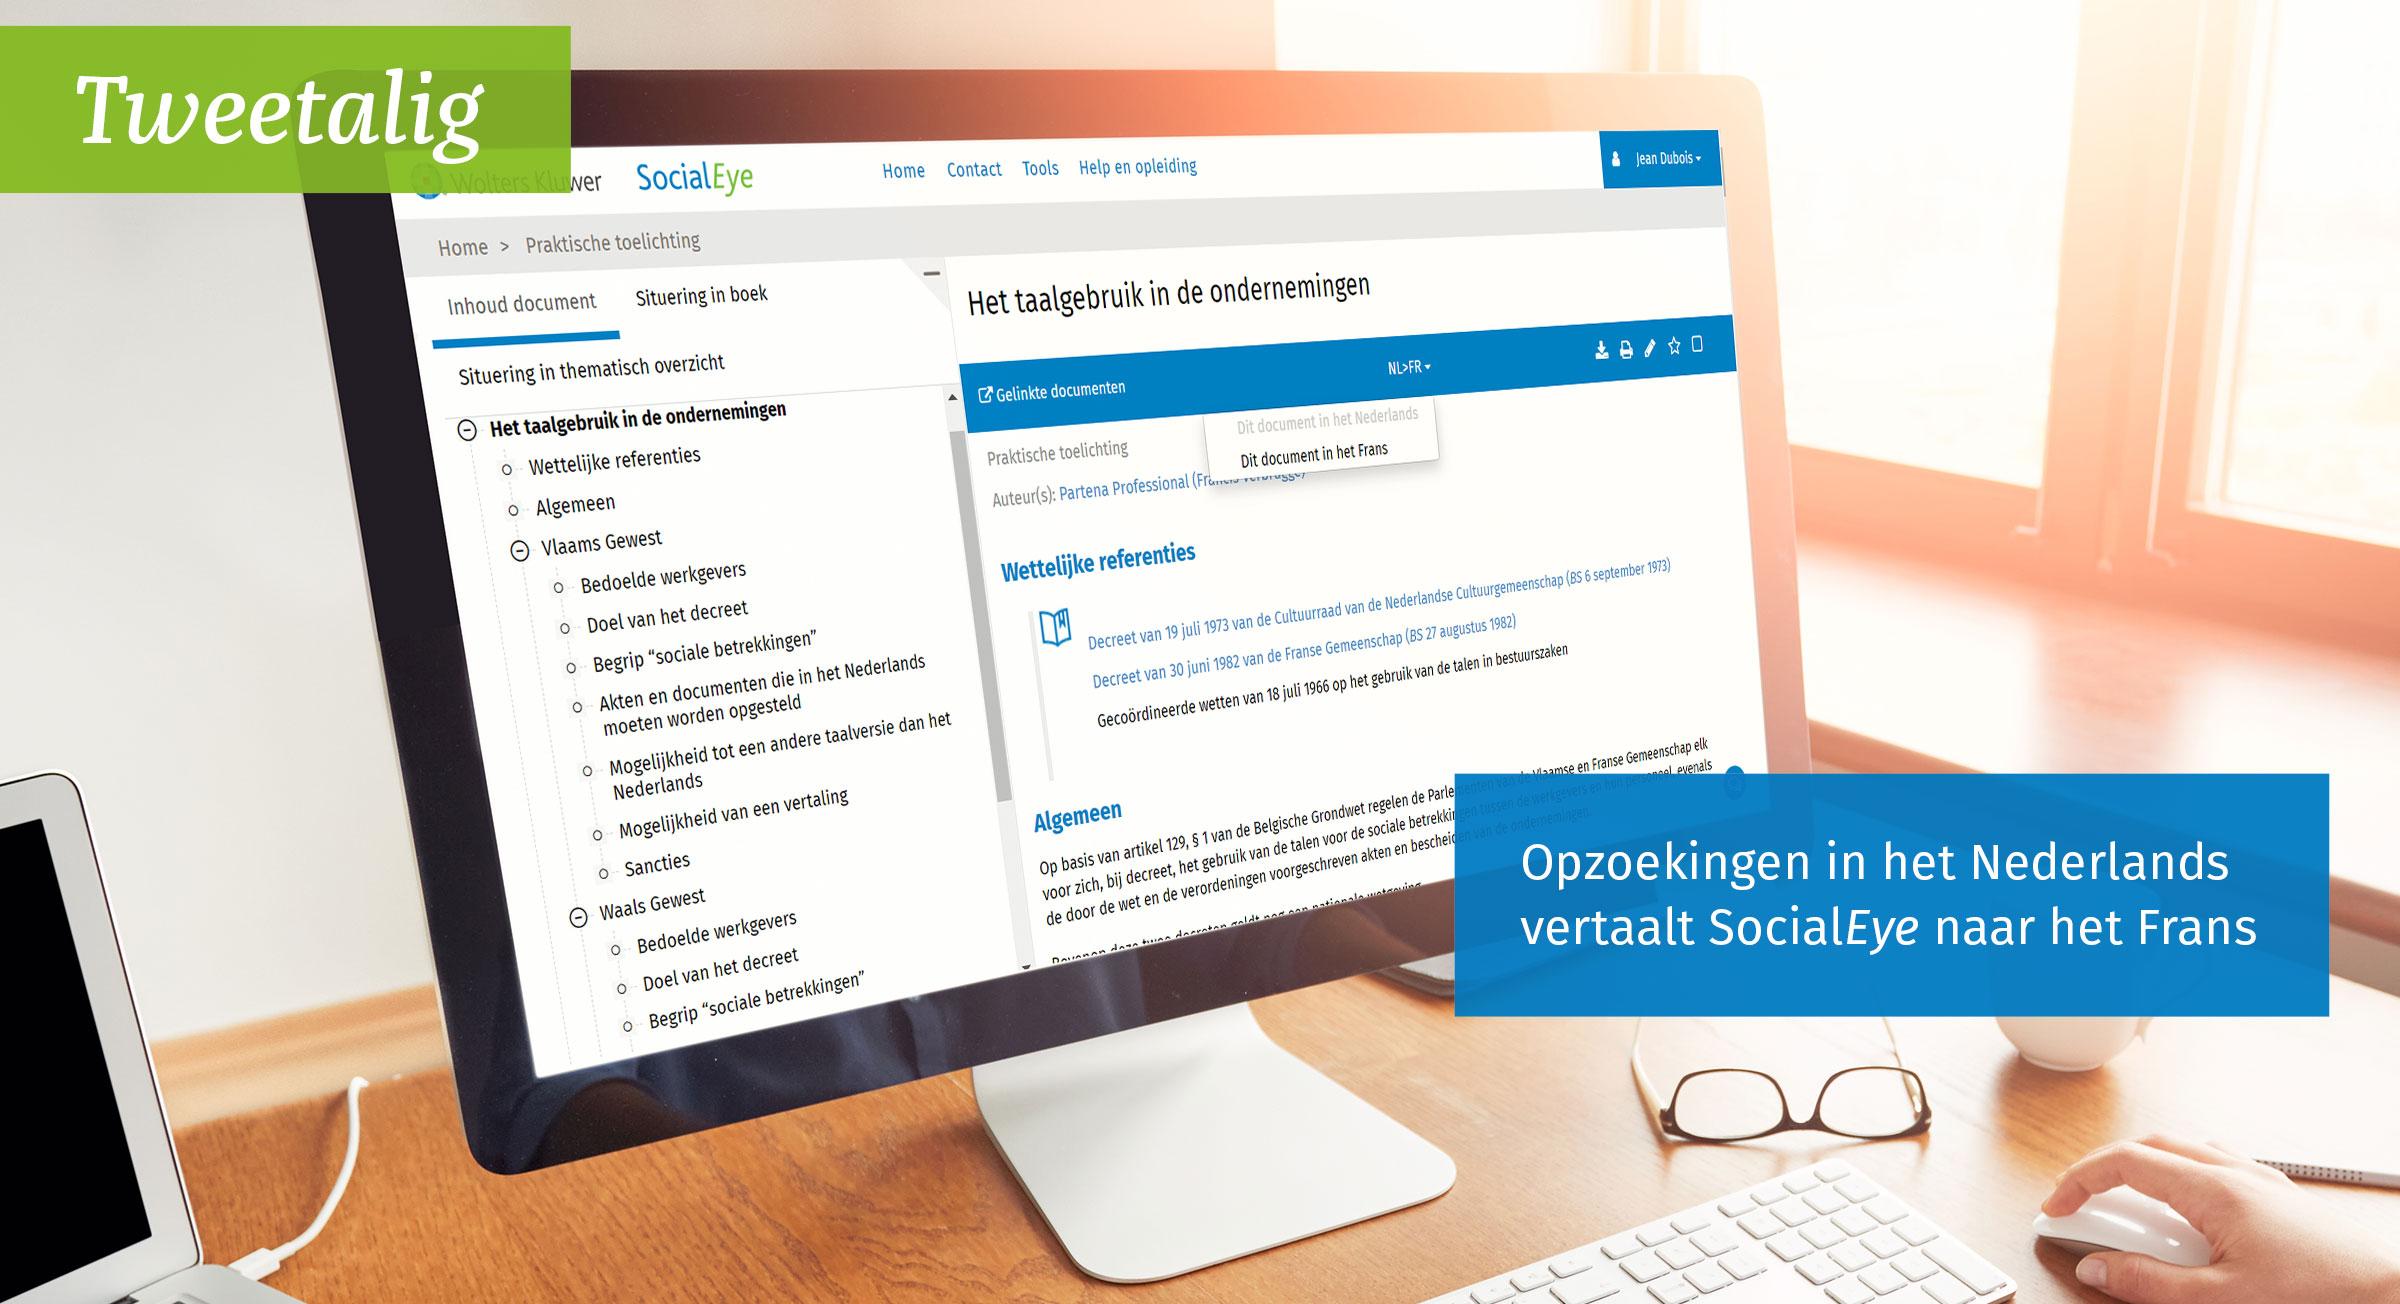 SocialEye-OneWeb-Tweetalig-1200x652x2-2020-NL2e